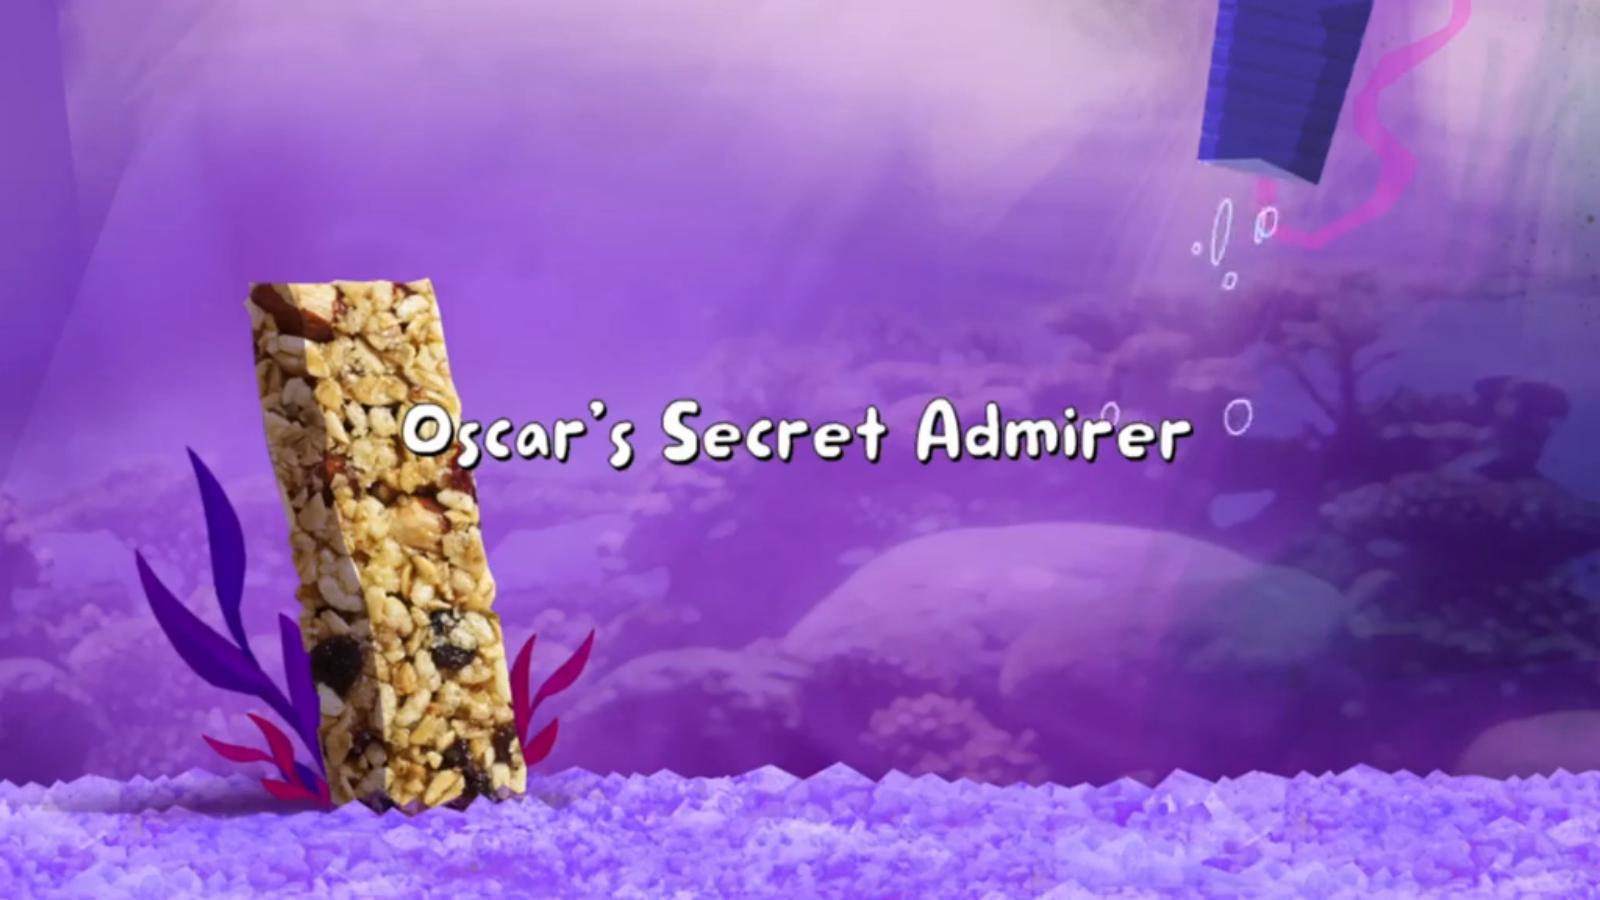 Oscar's Secret Admirer